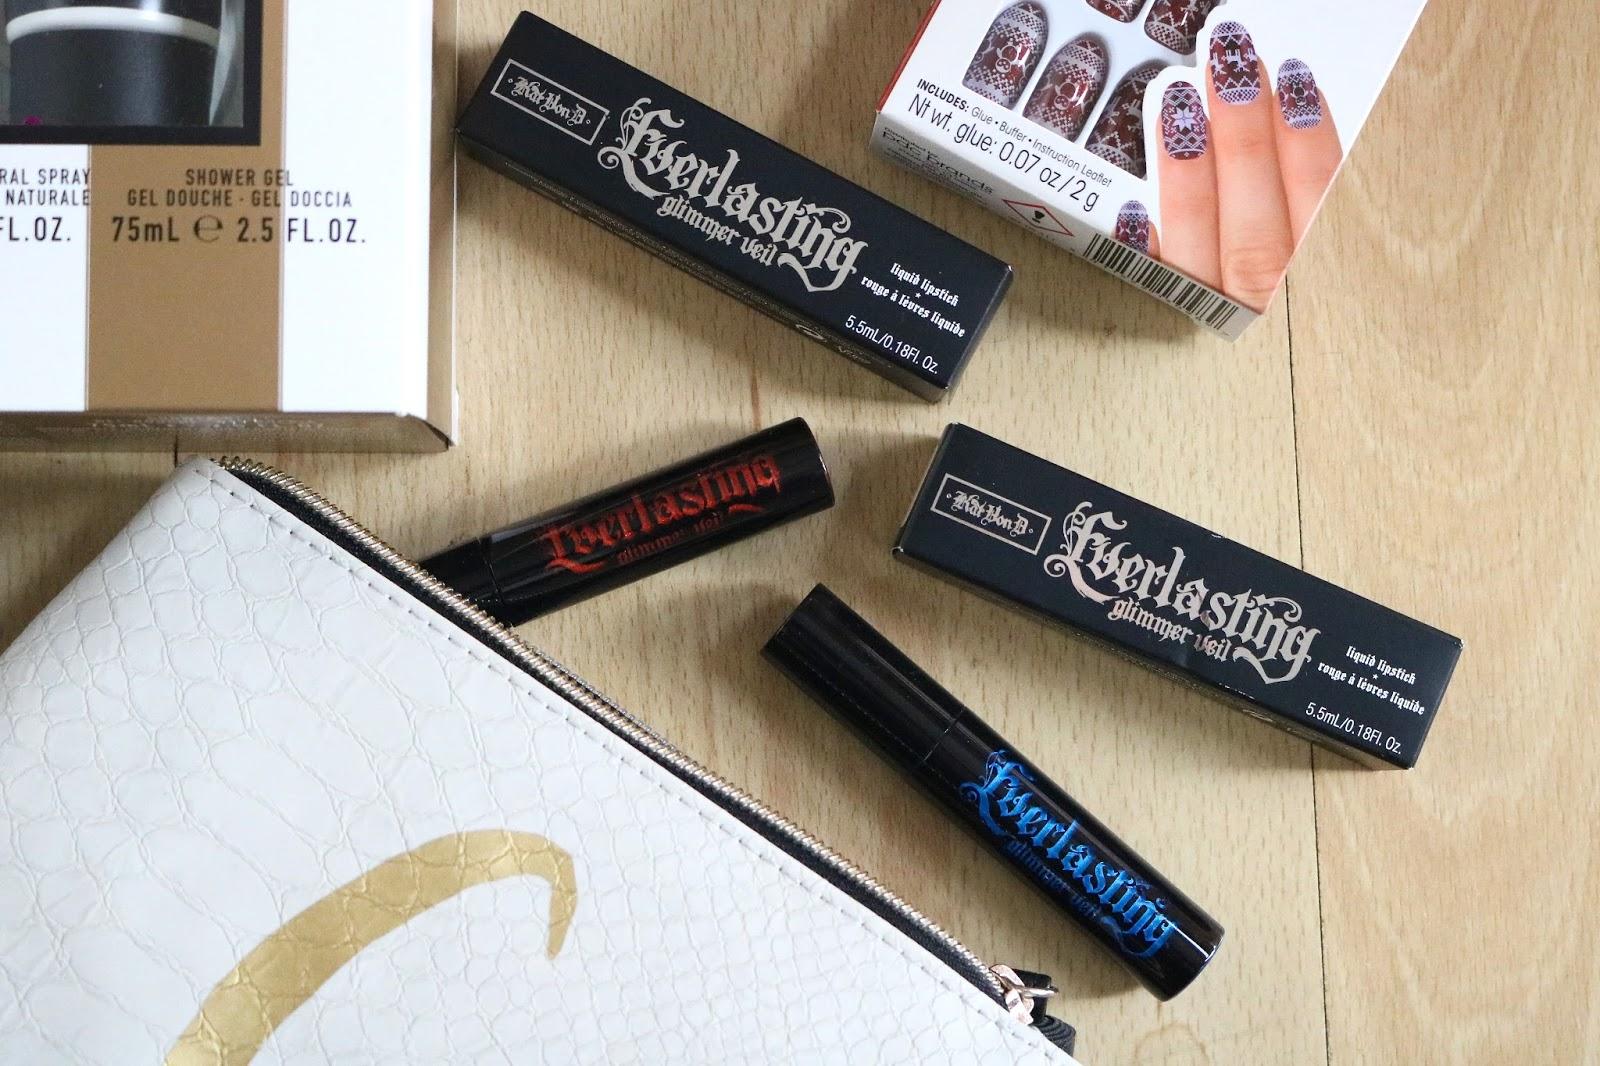 Kat von d everlasting glimmer veil liquid lipsticks